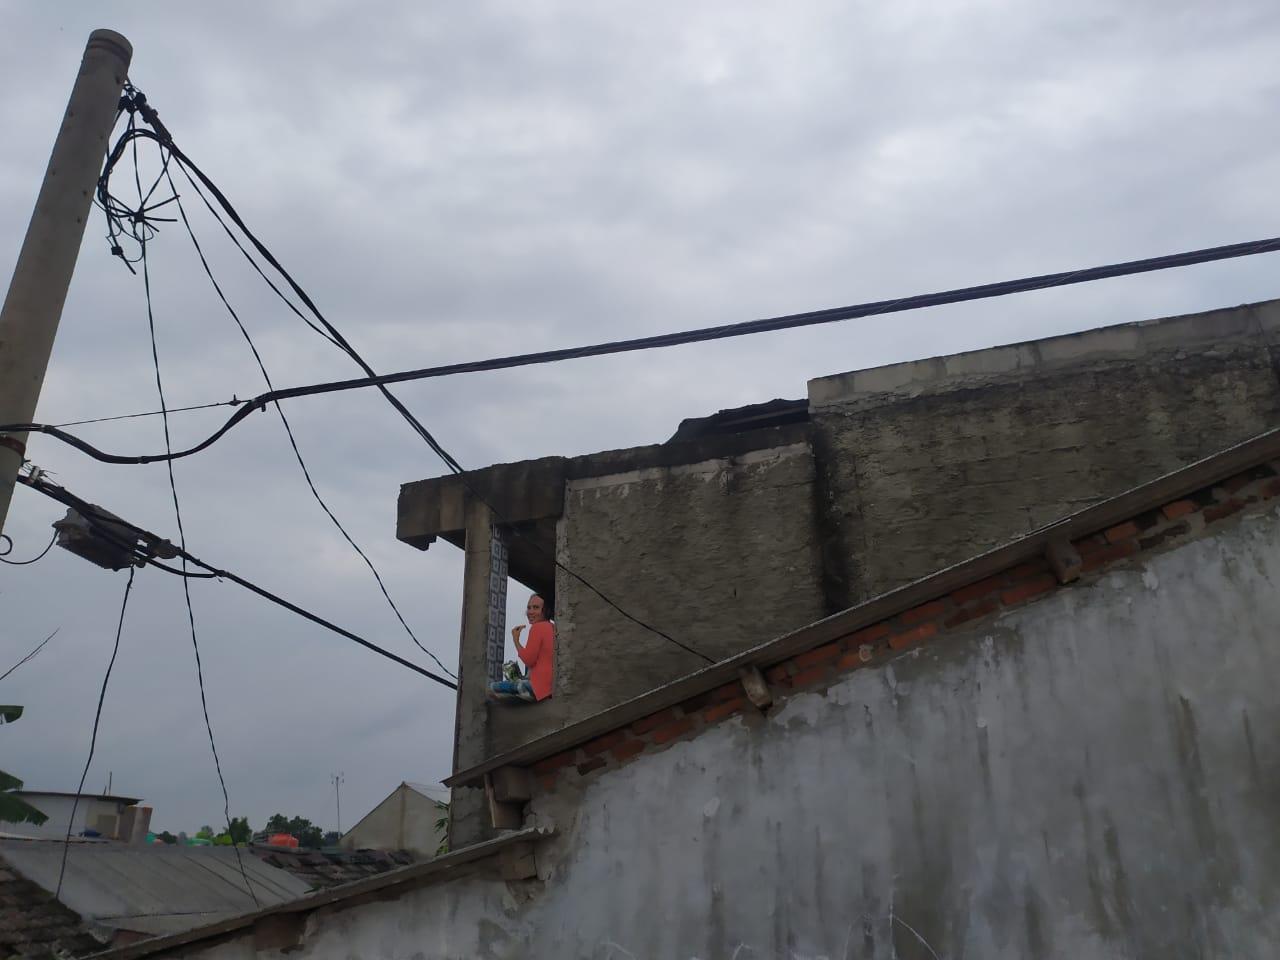 Tampak ibu-ibu bertahan di atap rumahnya padahal terdampak banjir di Perumahan Pesona Serpong, Kademangan, Setu, Tangsel, Rabu (1/1/2020).